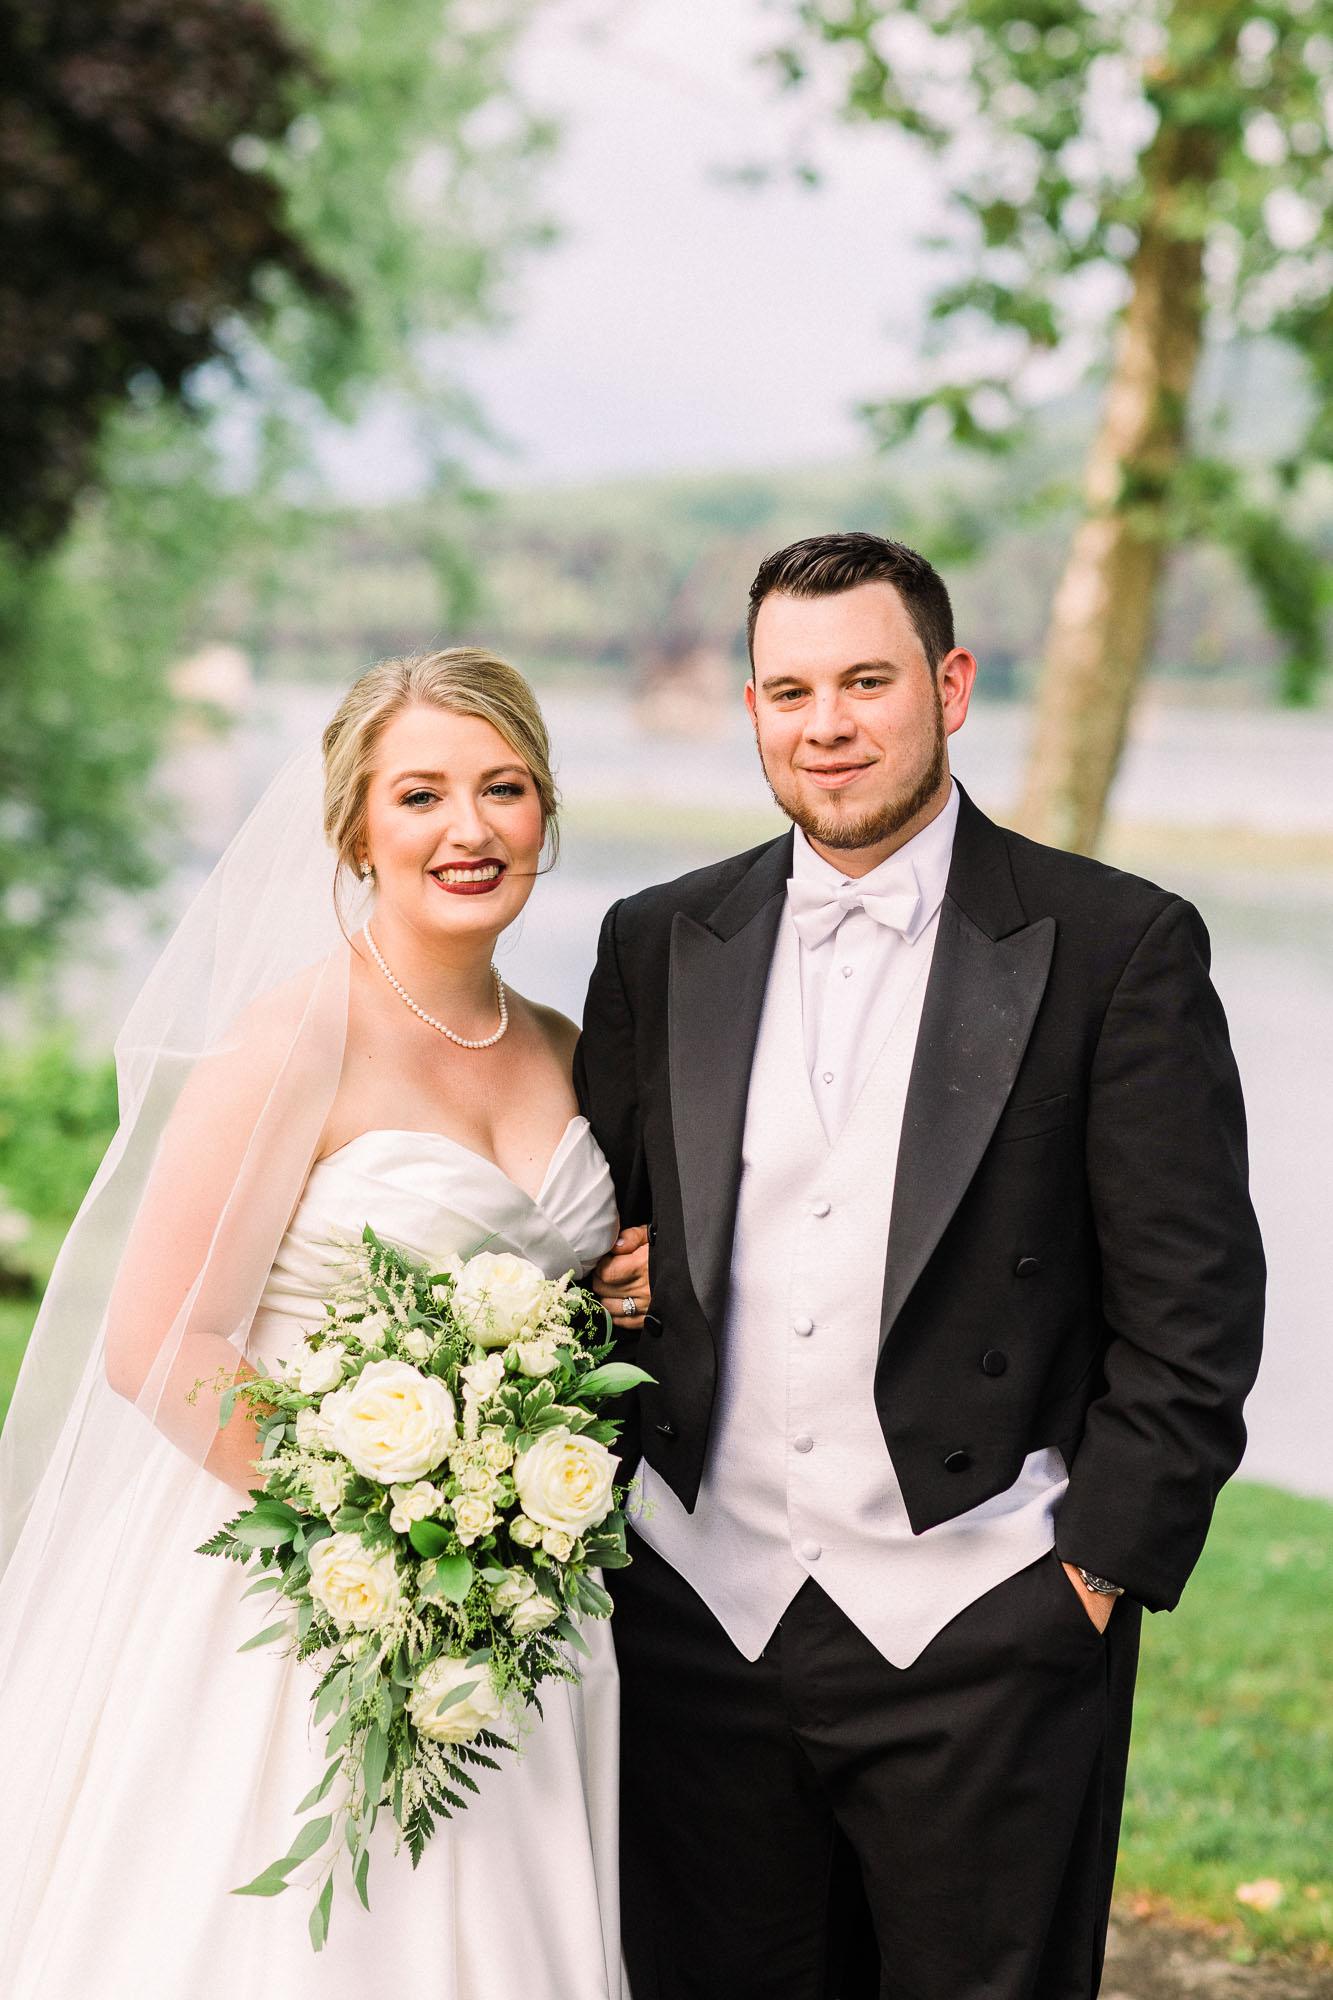 isle-of-que-wedding-4073.jpg